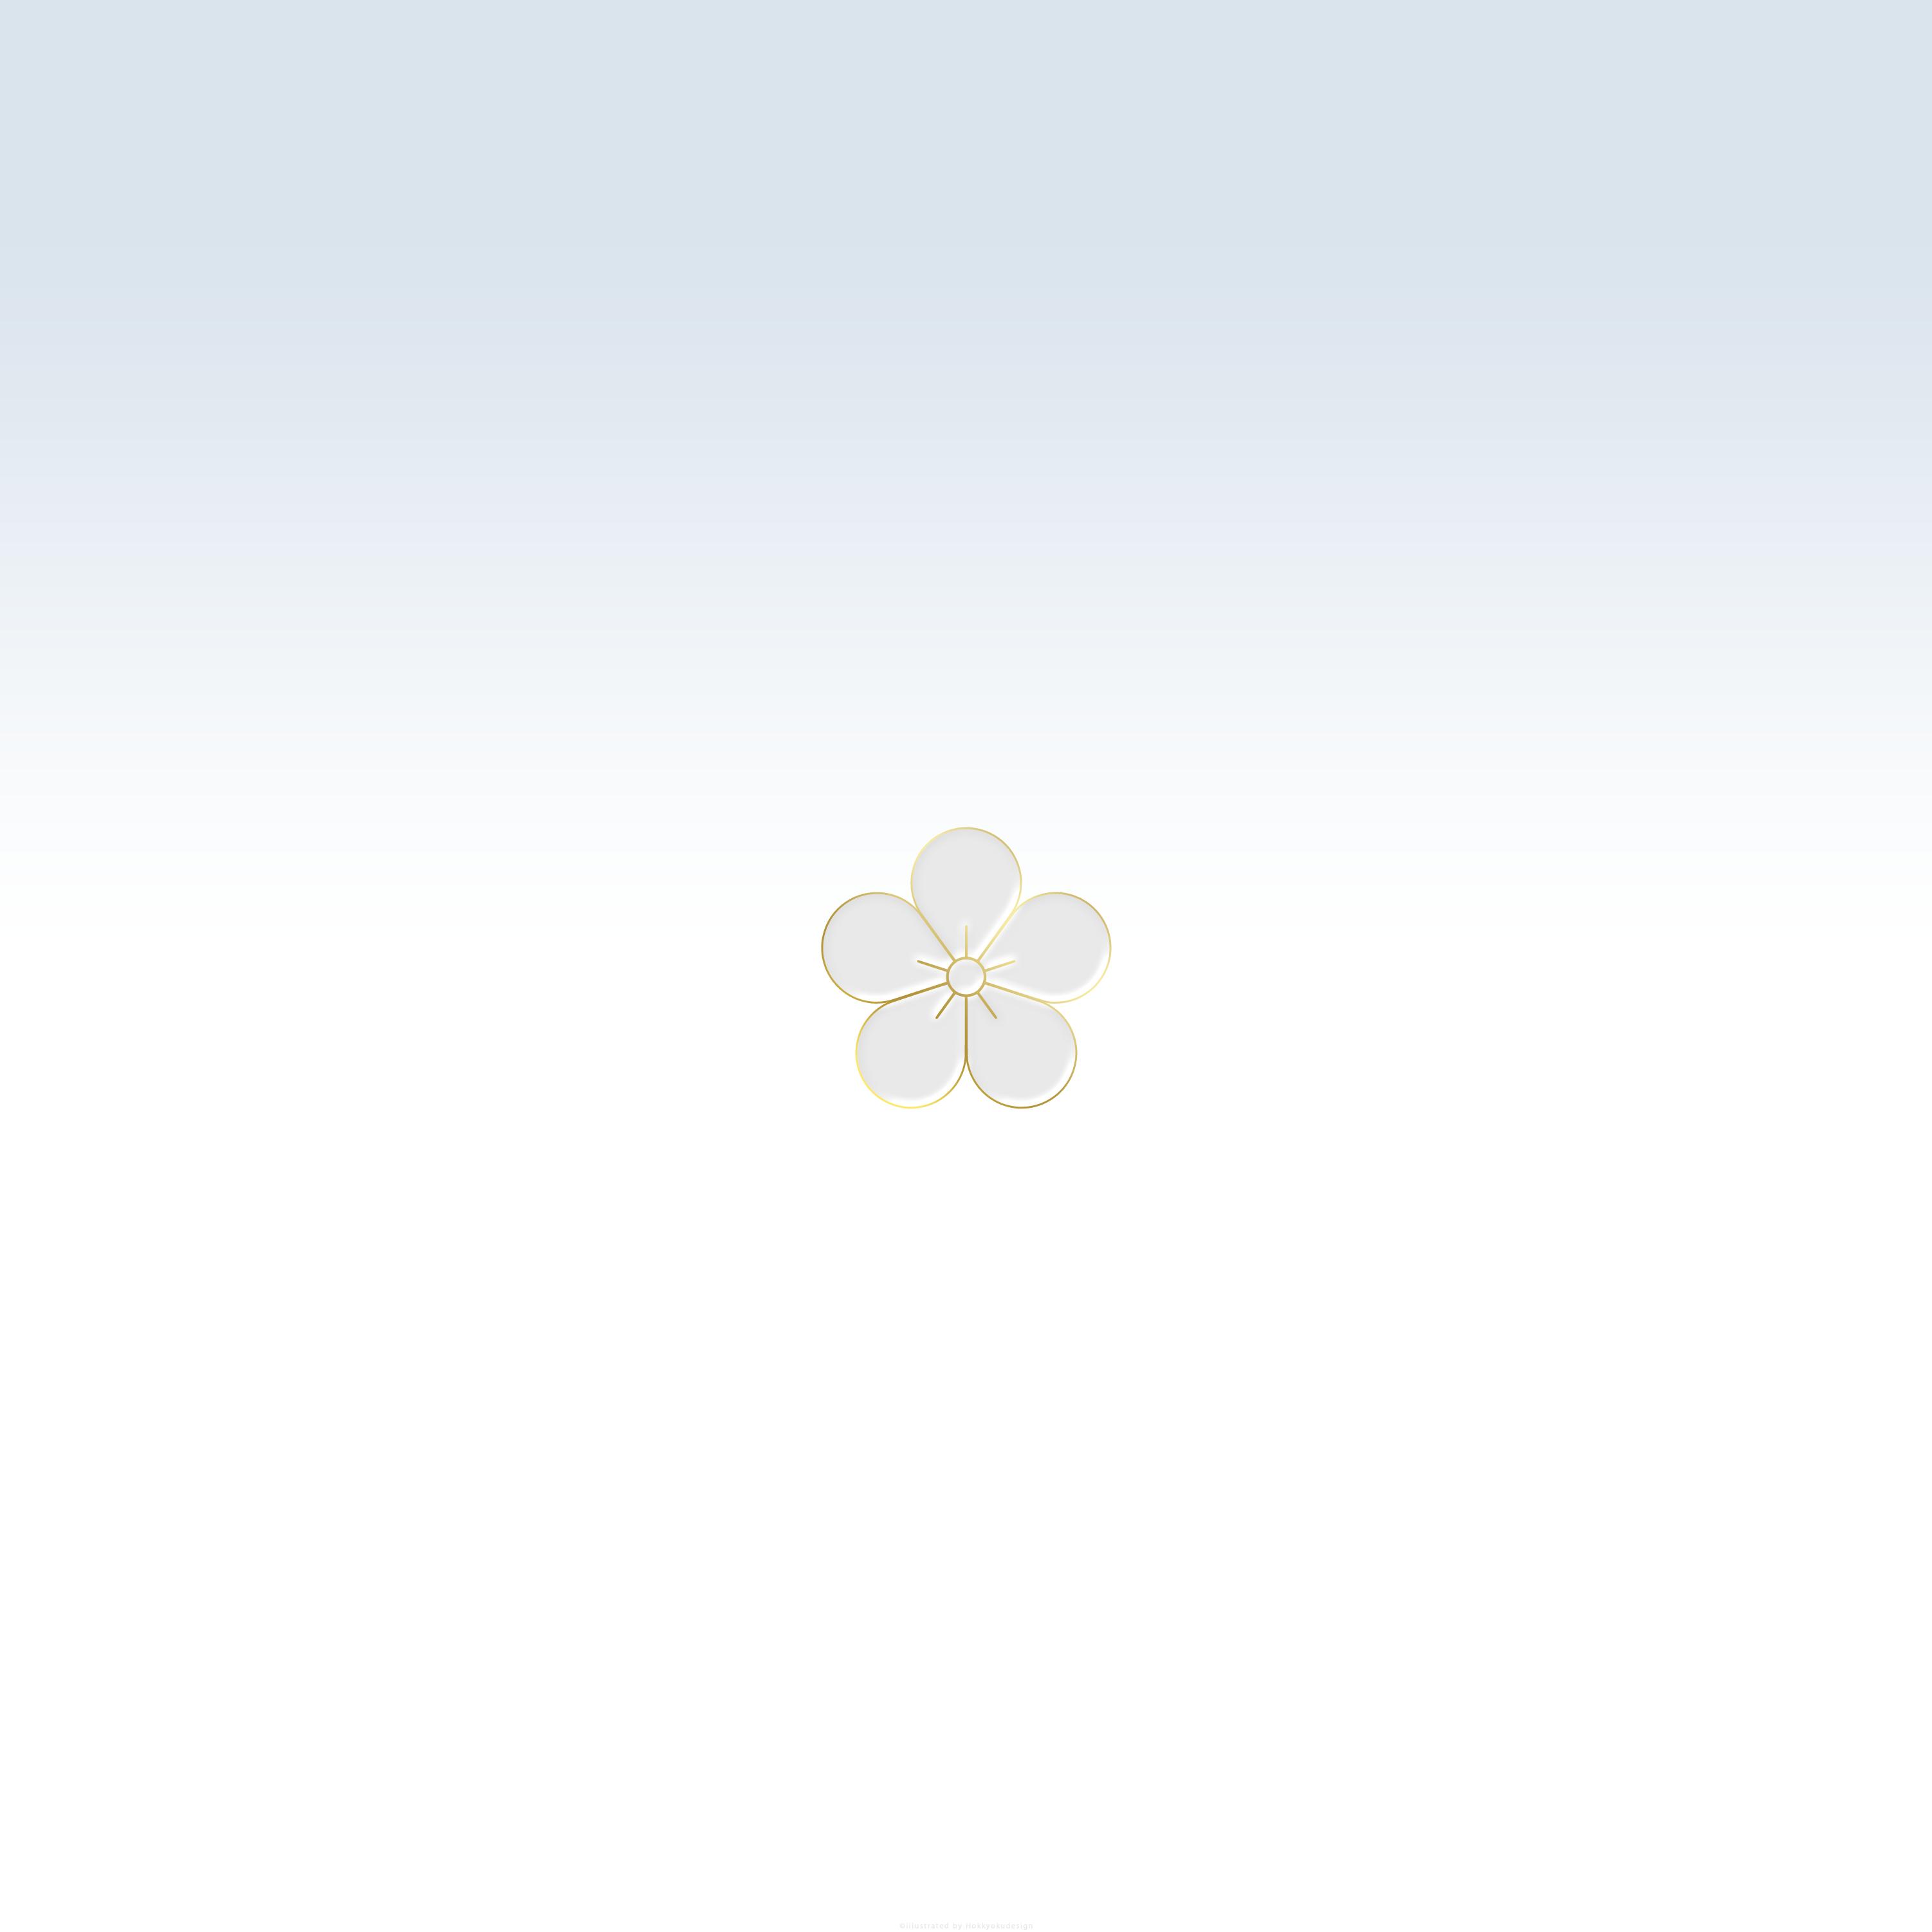 Iphone Android壁紙 梅ひとつ3 シンプルに梅をひとつ配置